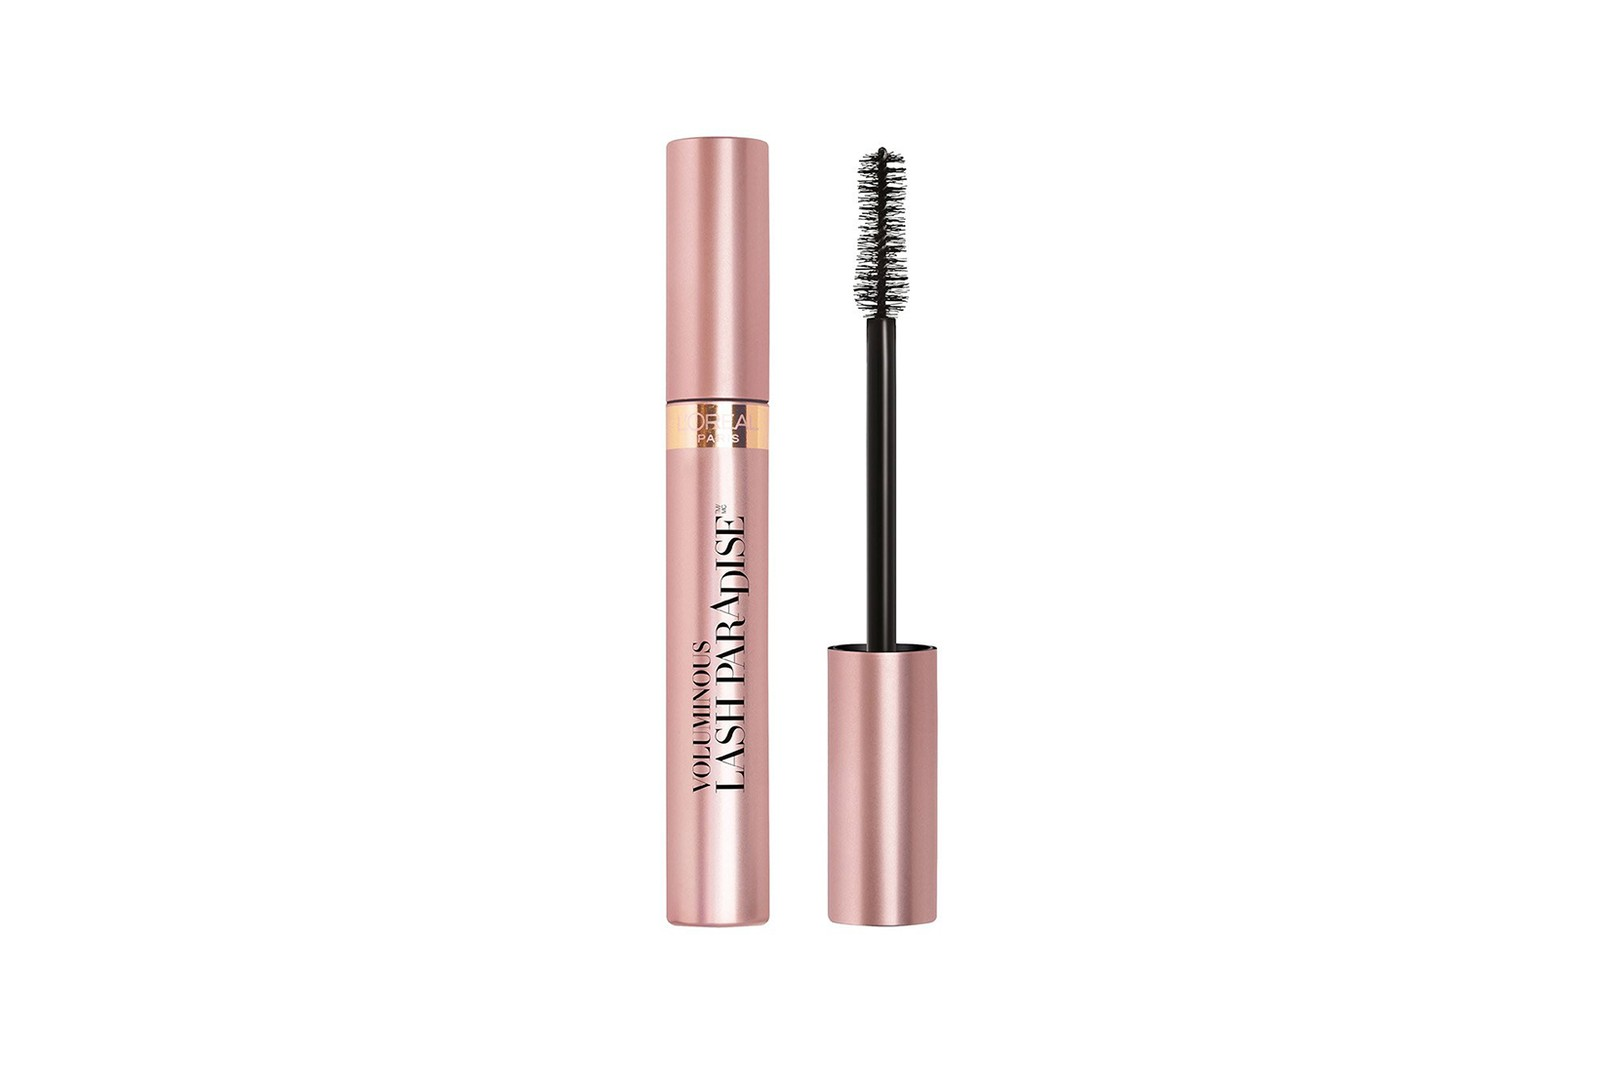 Waterproof Mascara Byredo Tears in Rain Makeup Campaign Beauty Product Eye Lashes Smudge Proof